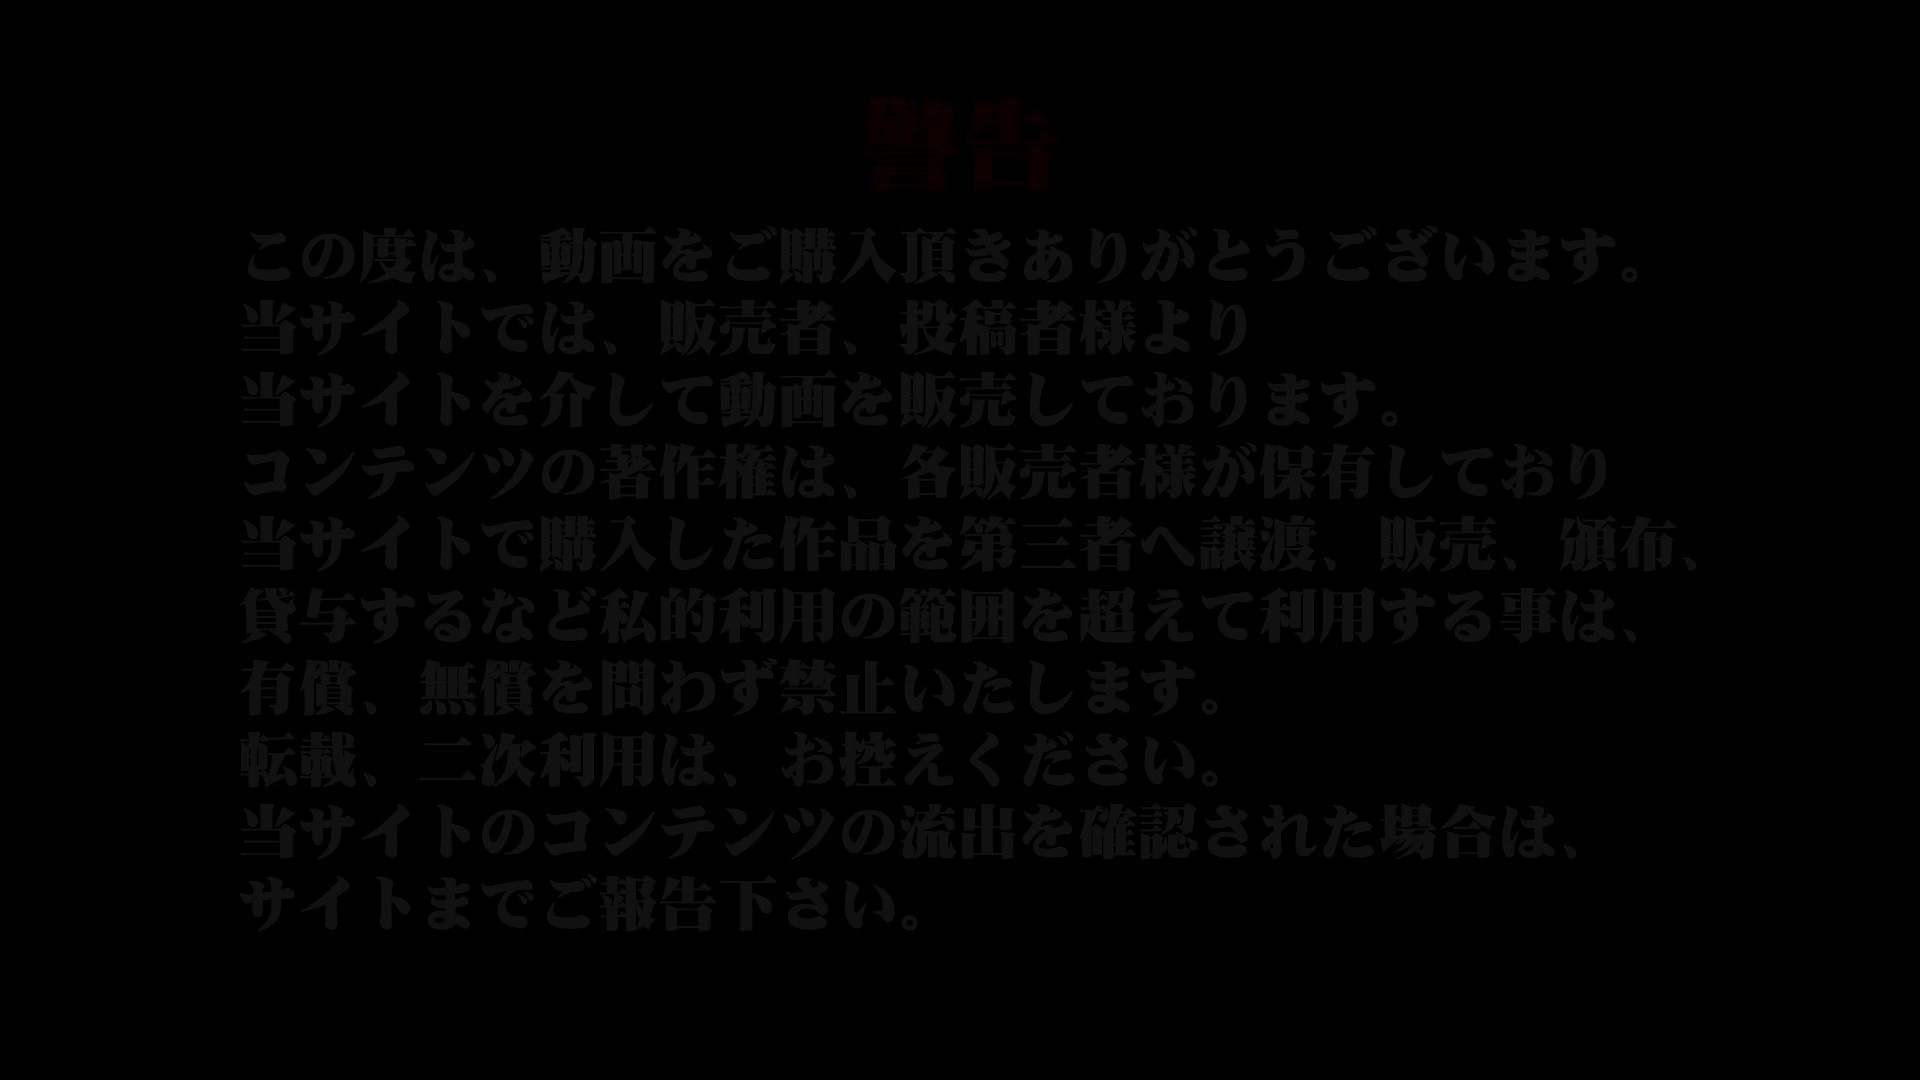 JD盗撮 美女の洗面所の秘密 Vol.68 エッチな盗撮 セックス無修正動画無料 113pic 3